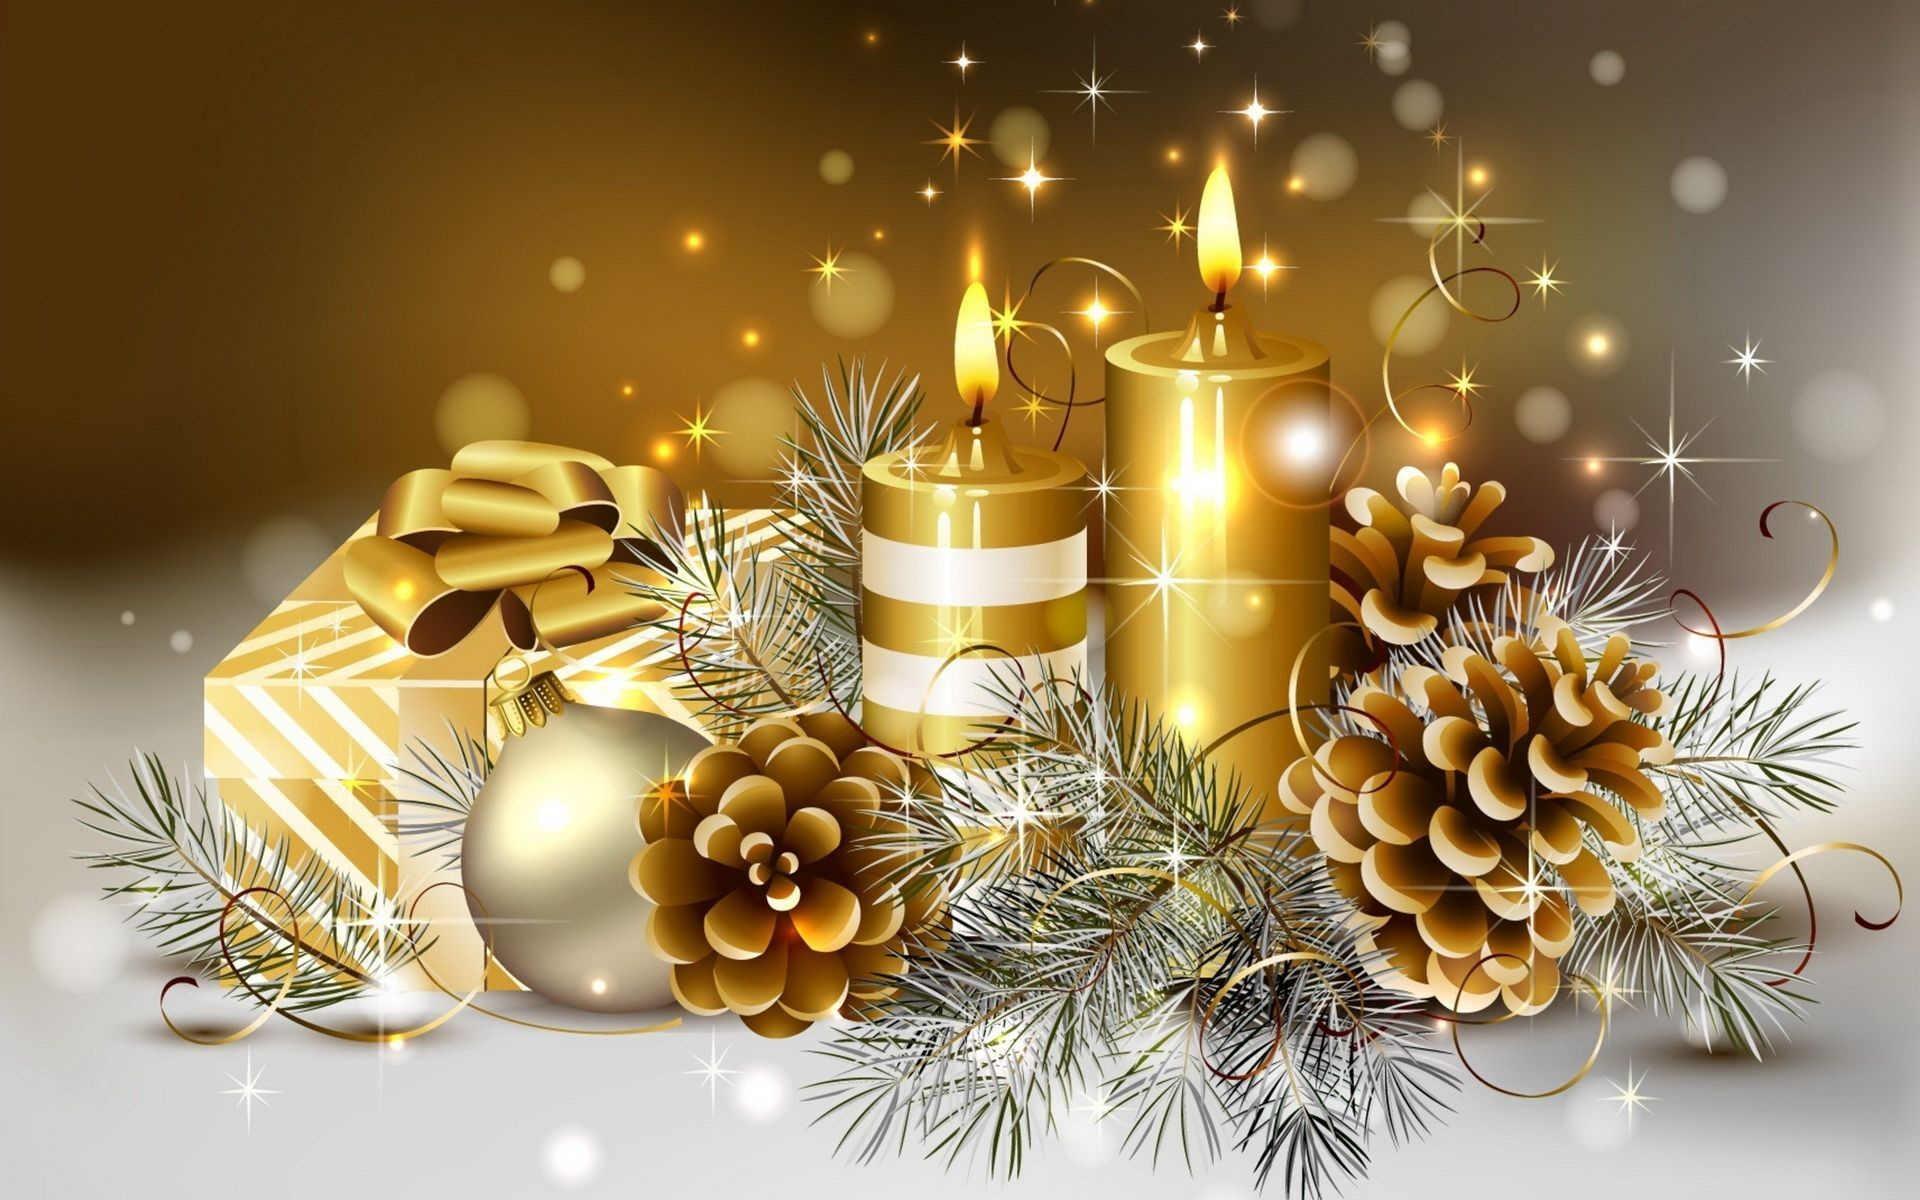 merry-christmas-wallpapers-free-hd-for-desktop.jpg